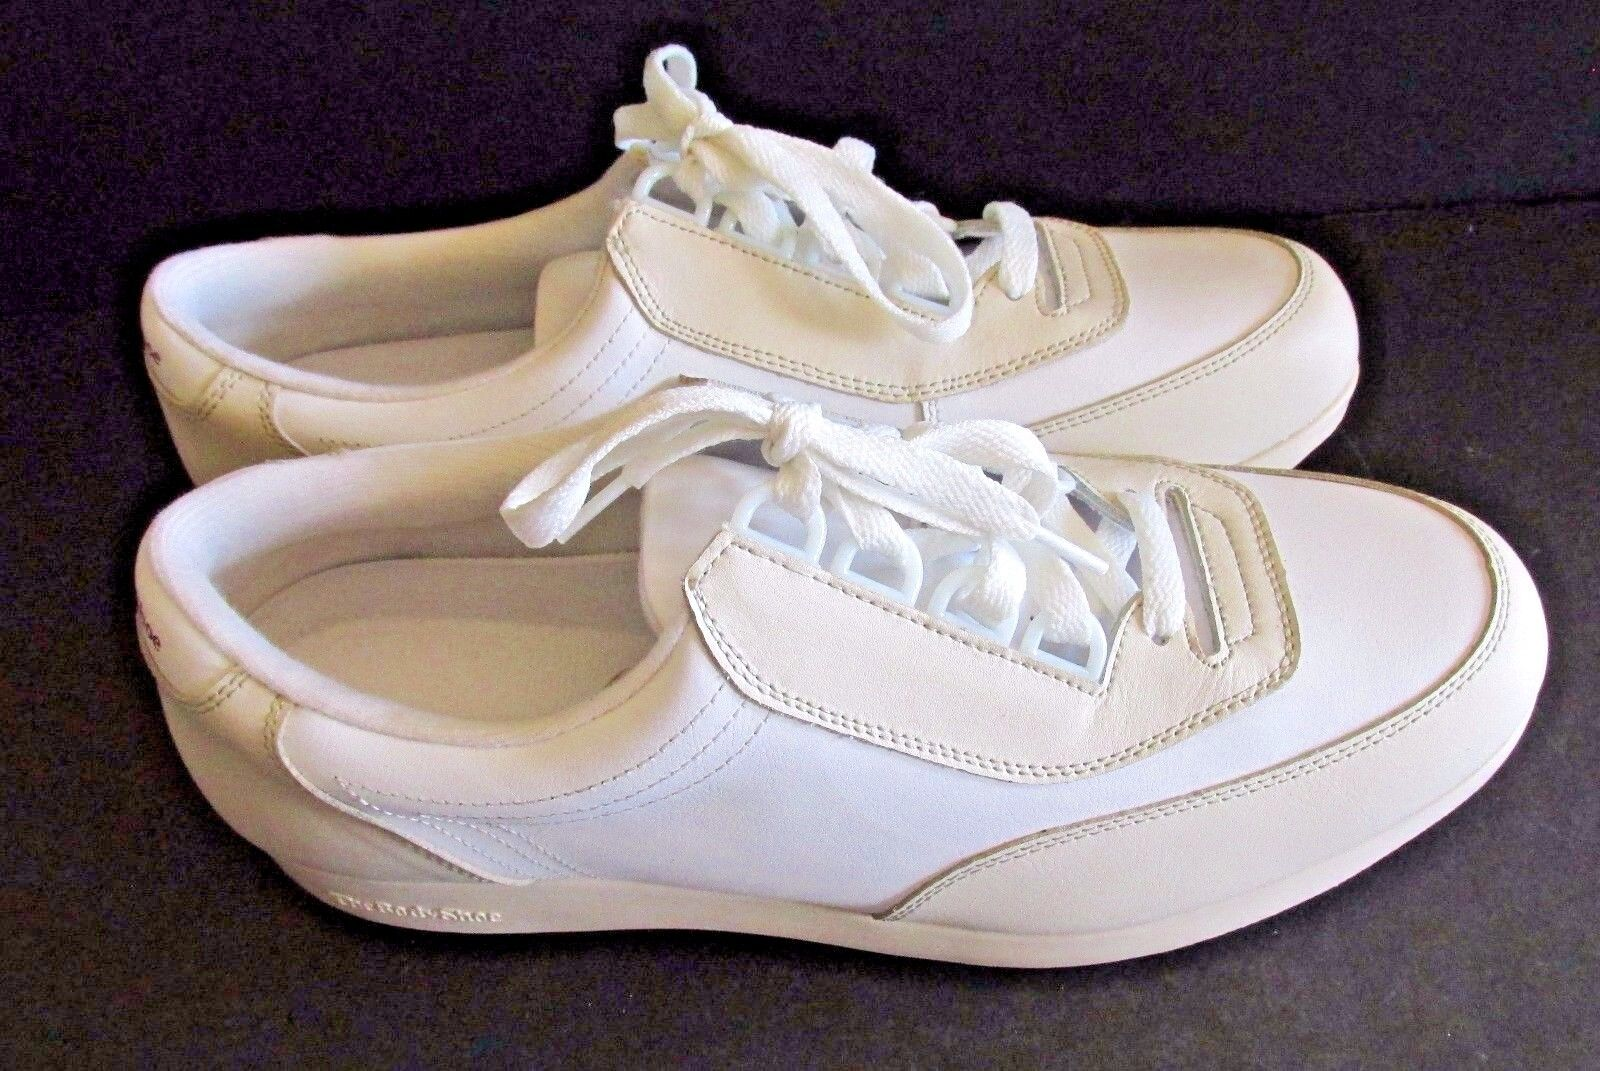 Hush Puppies Women's Upbeat Sneaker NIB Tan & White 10 EW EXTRA WIDE